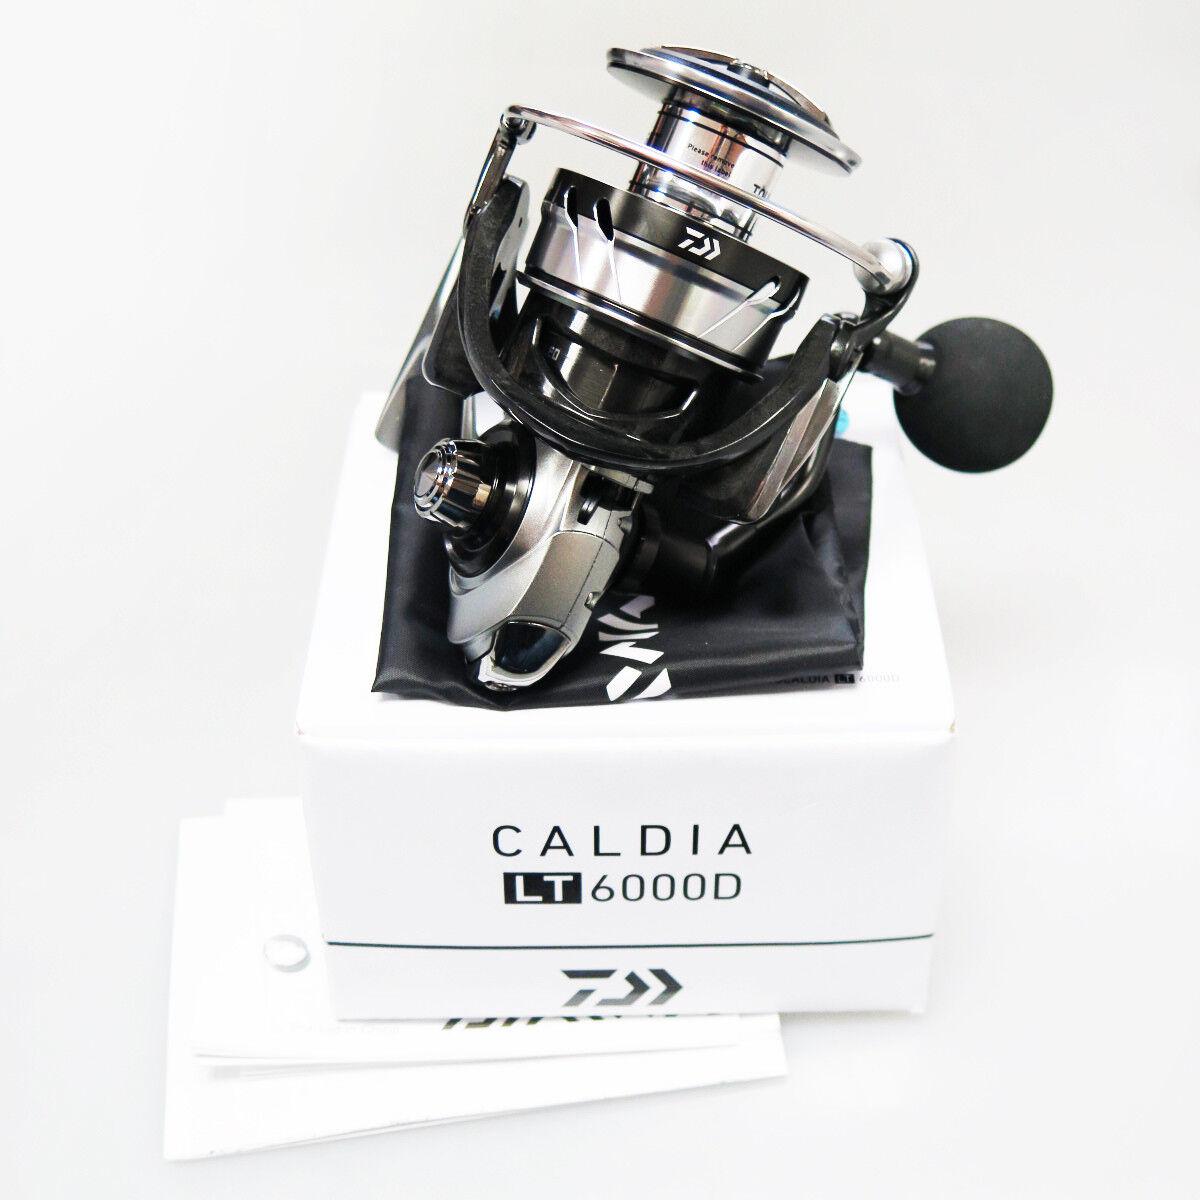 Nueva Luz 6000D Spinning Cocheretes Daiwa Caldia 2DAY Prioridad FEDEX a EE. UU.